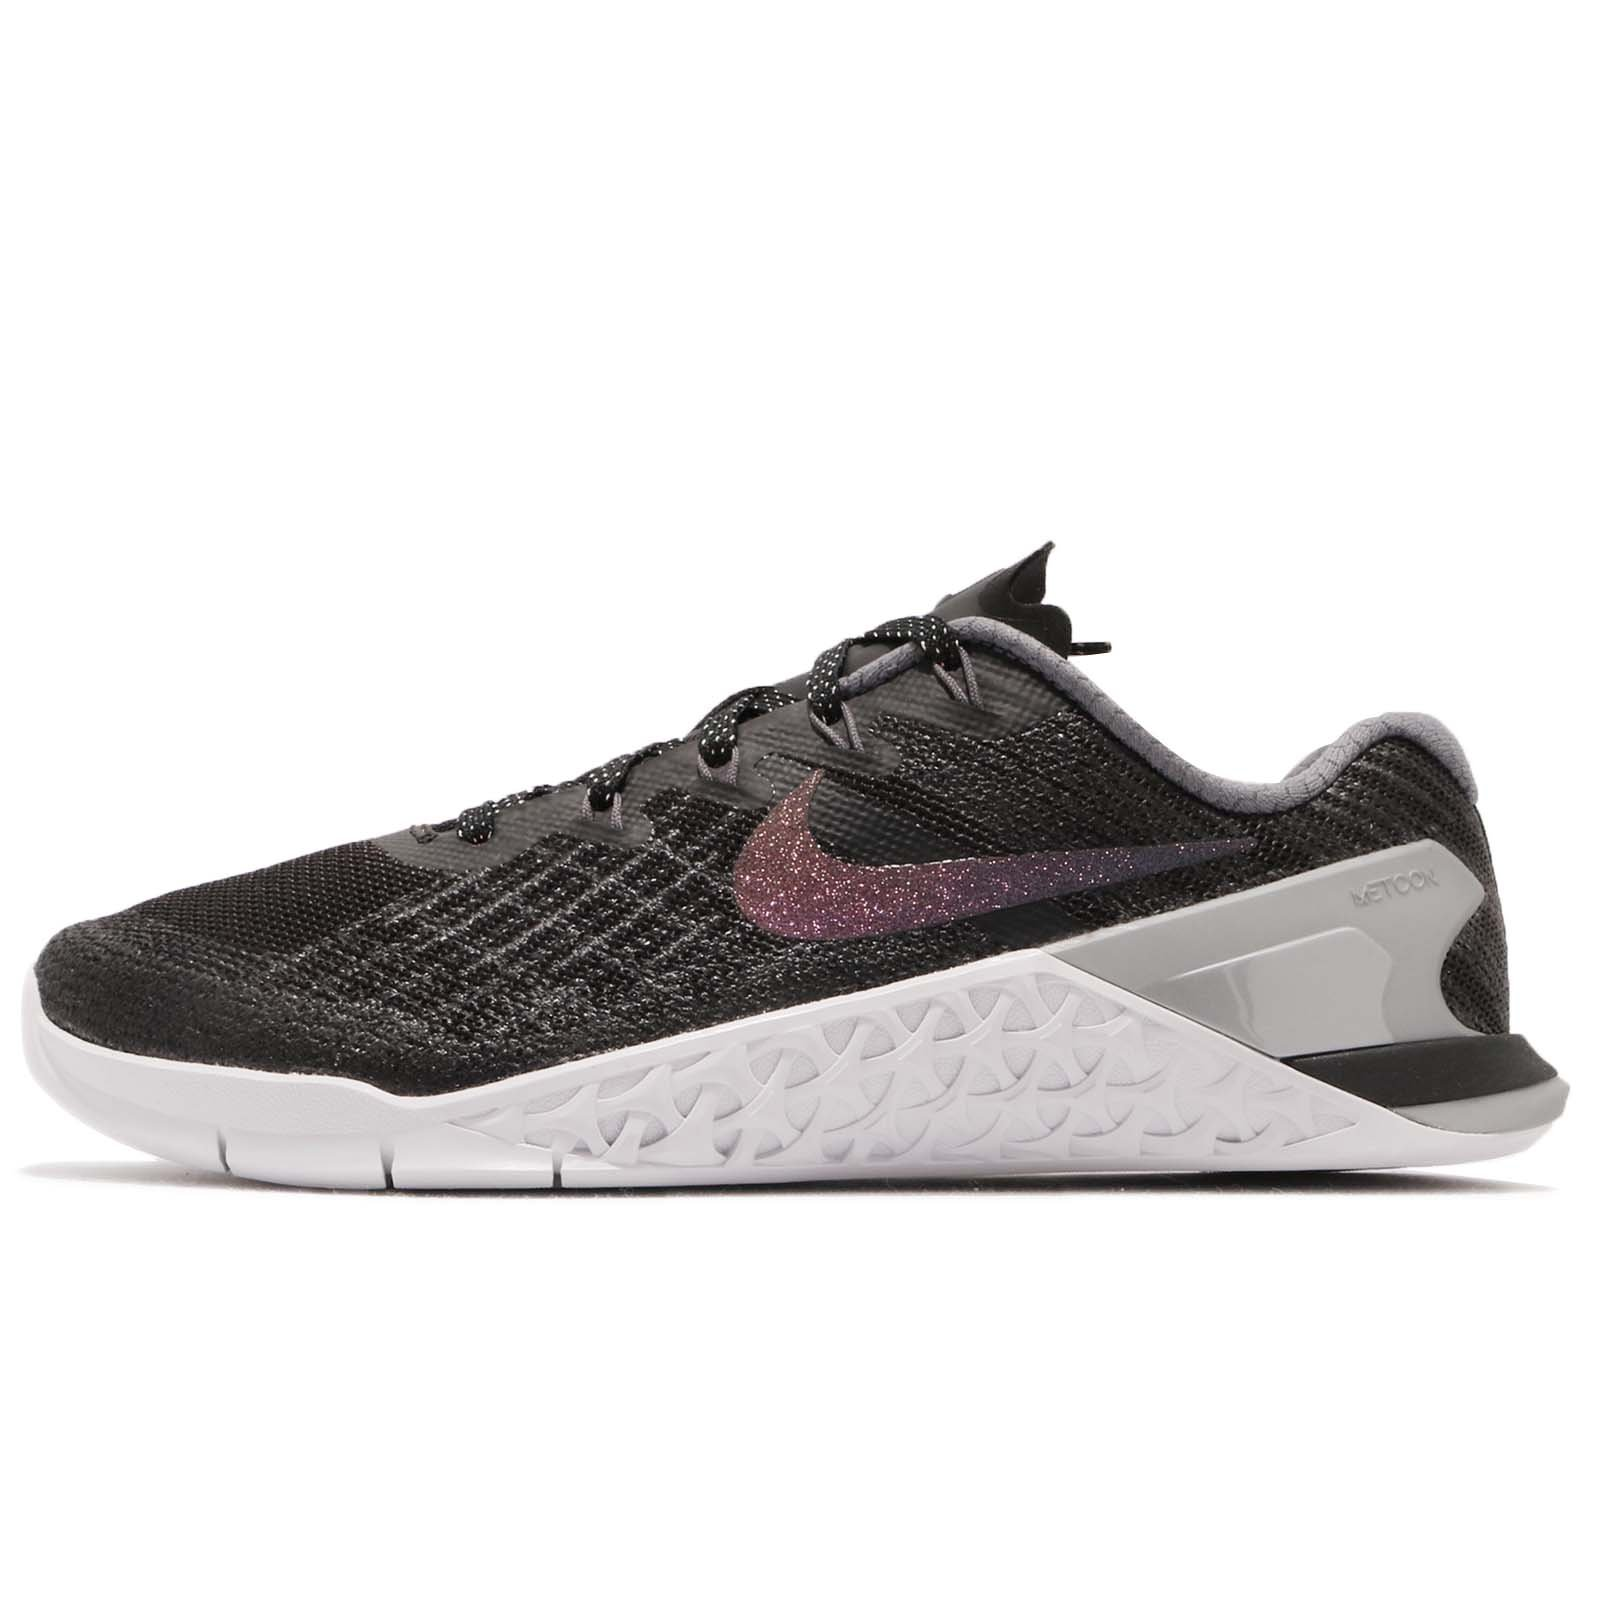 8231da63477bc Galleon - Nike Womens Metcon 3 Metallic Running Trainers 922880 Sneakers  Shoes (UK 4 US 6.5 EU 37.5